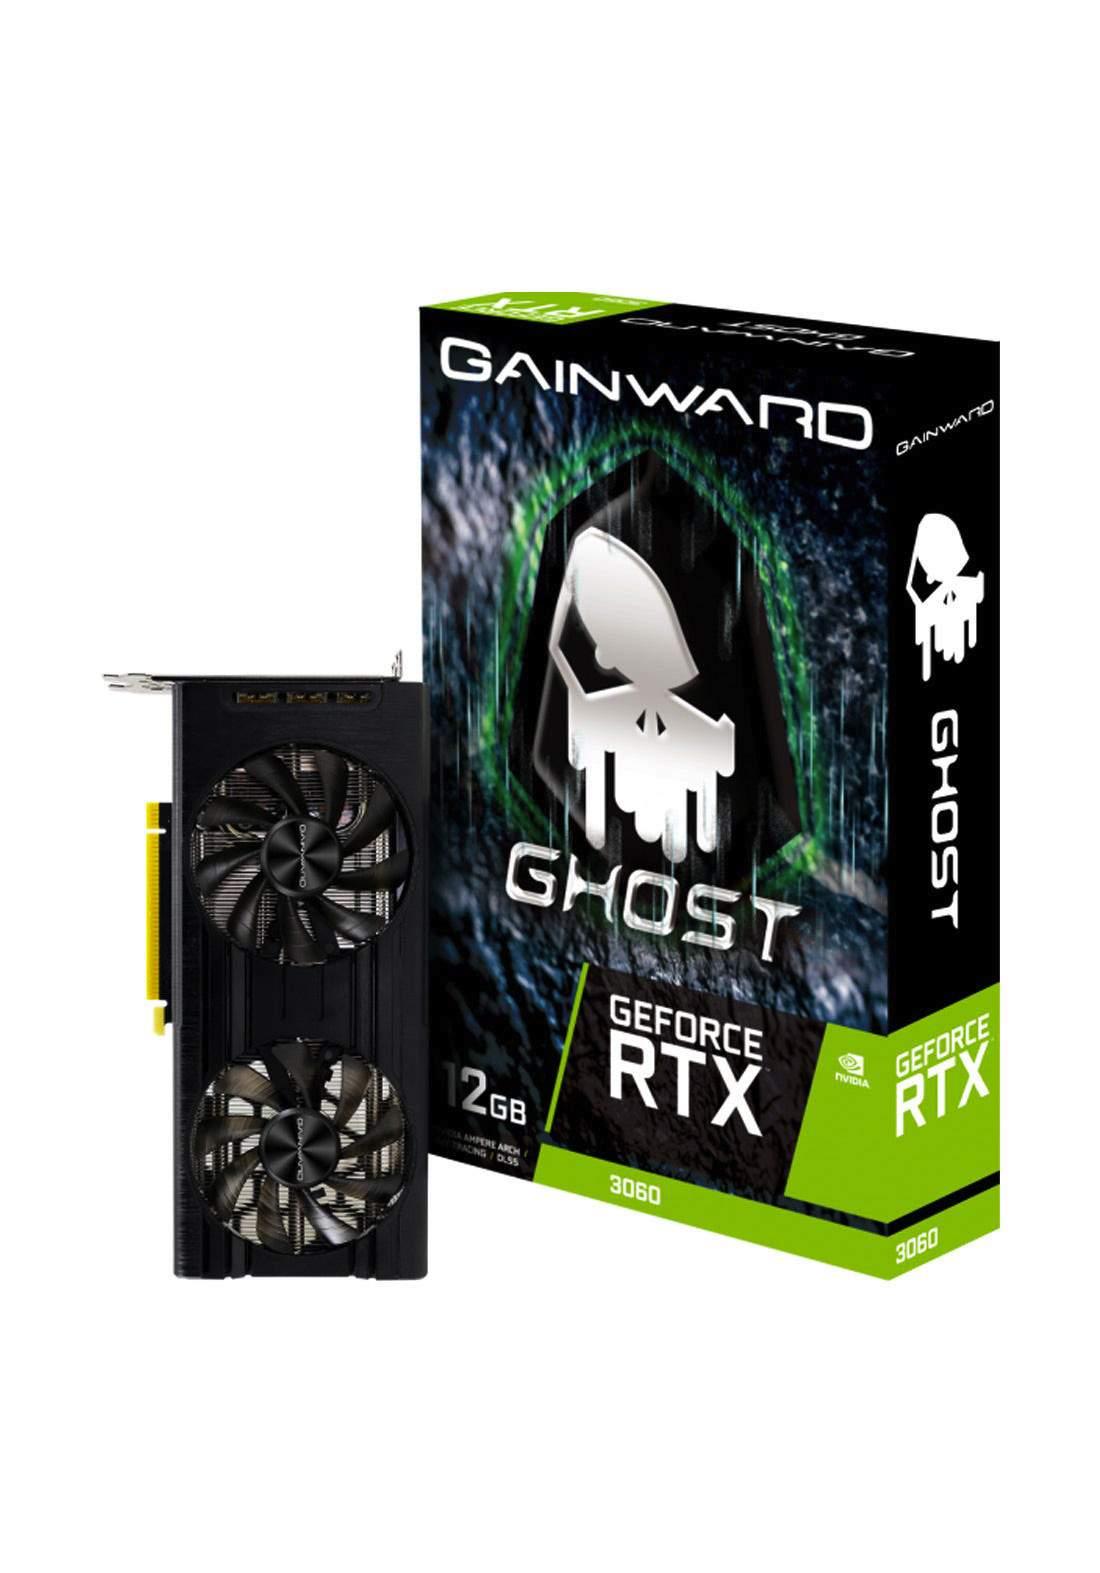 Gainward GeForce RTX 3060 Ghost 12GB  Graphics Card - Black